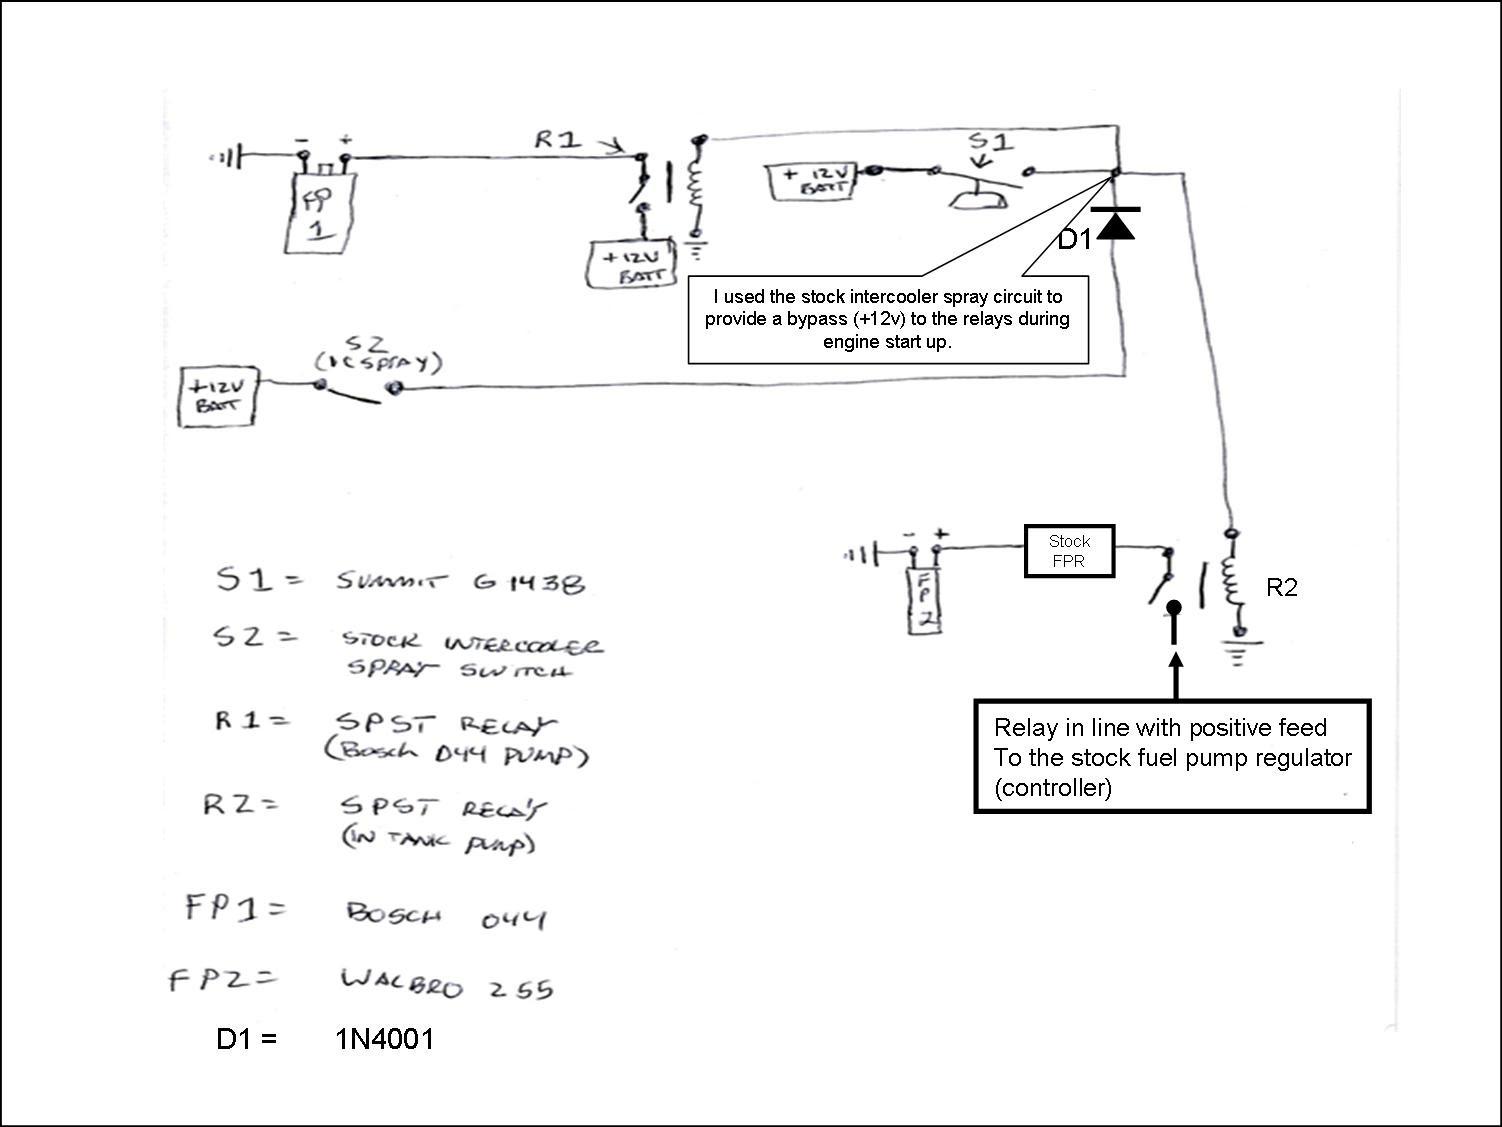 Diagram Subaru 05 Sti Wiring Diagram Full Version Hd Quality Wiring Diagram Ideaschematic2g Angelux It